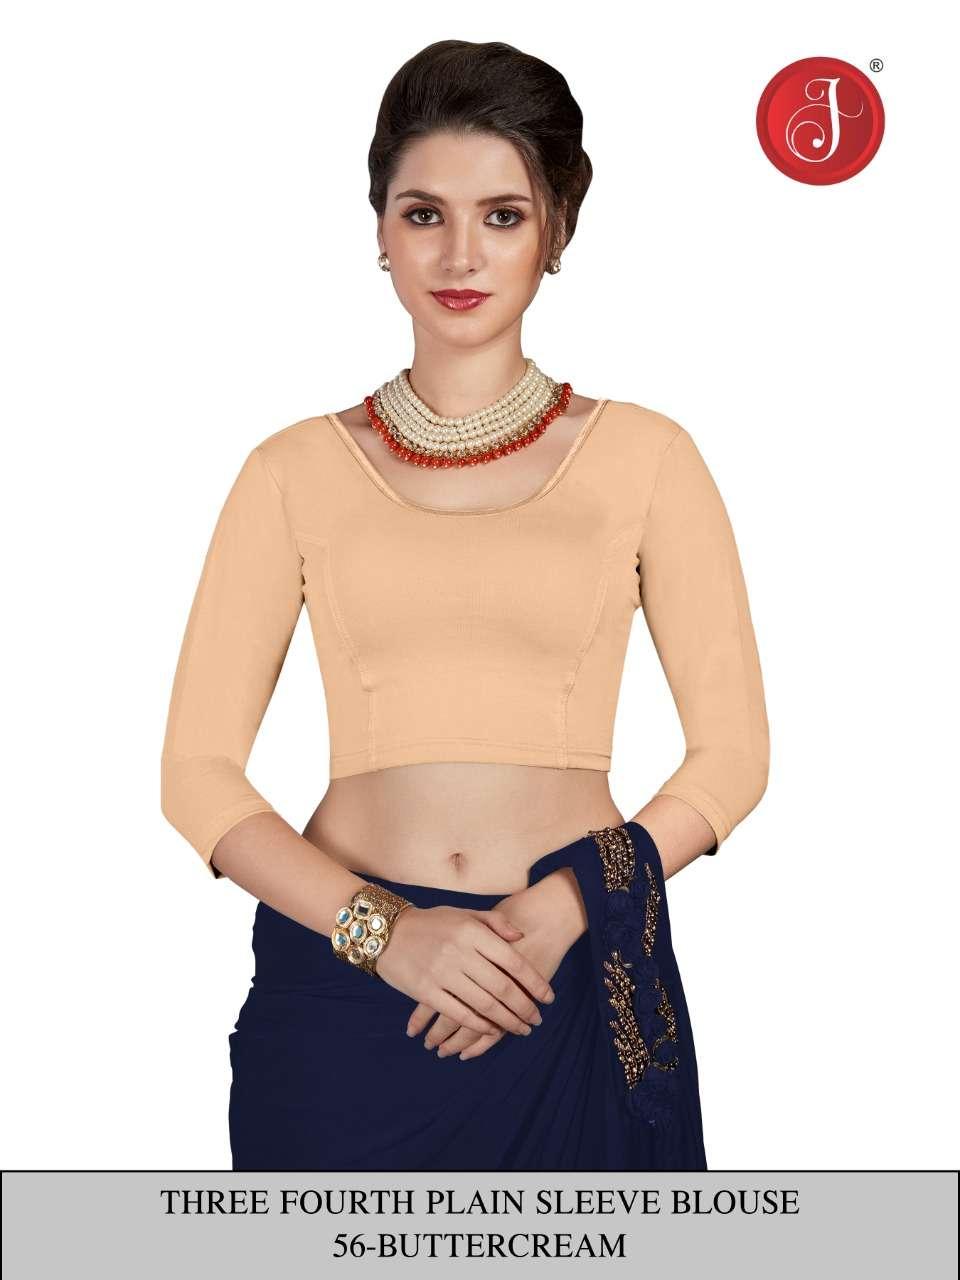 Jelite 3/4 Net sleeve Blouse Ladies Blouse Cheap Rate Seller Cotton Blouse Collection